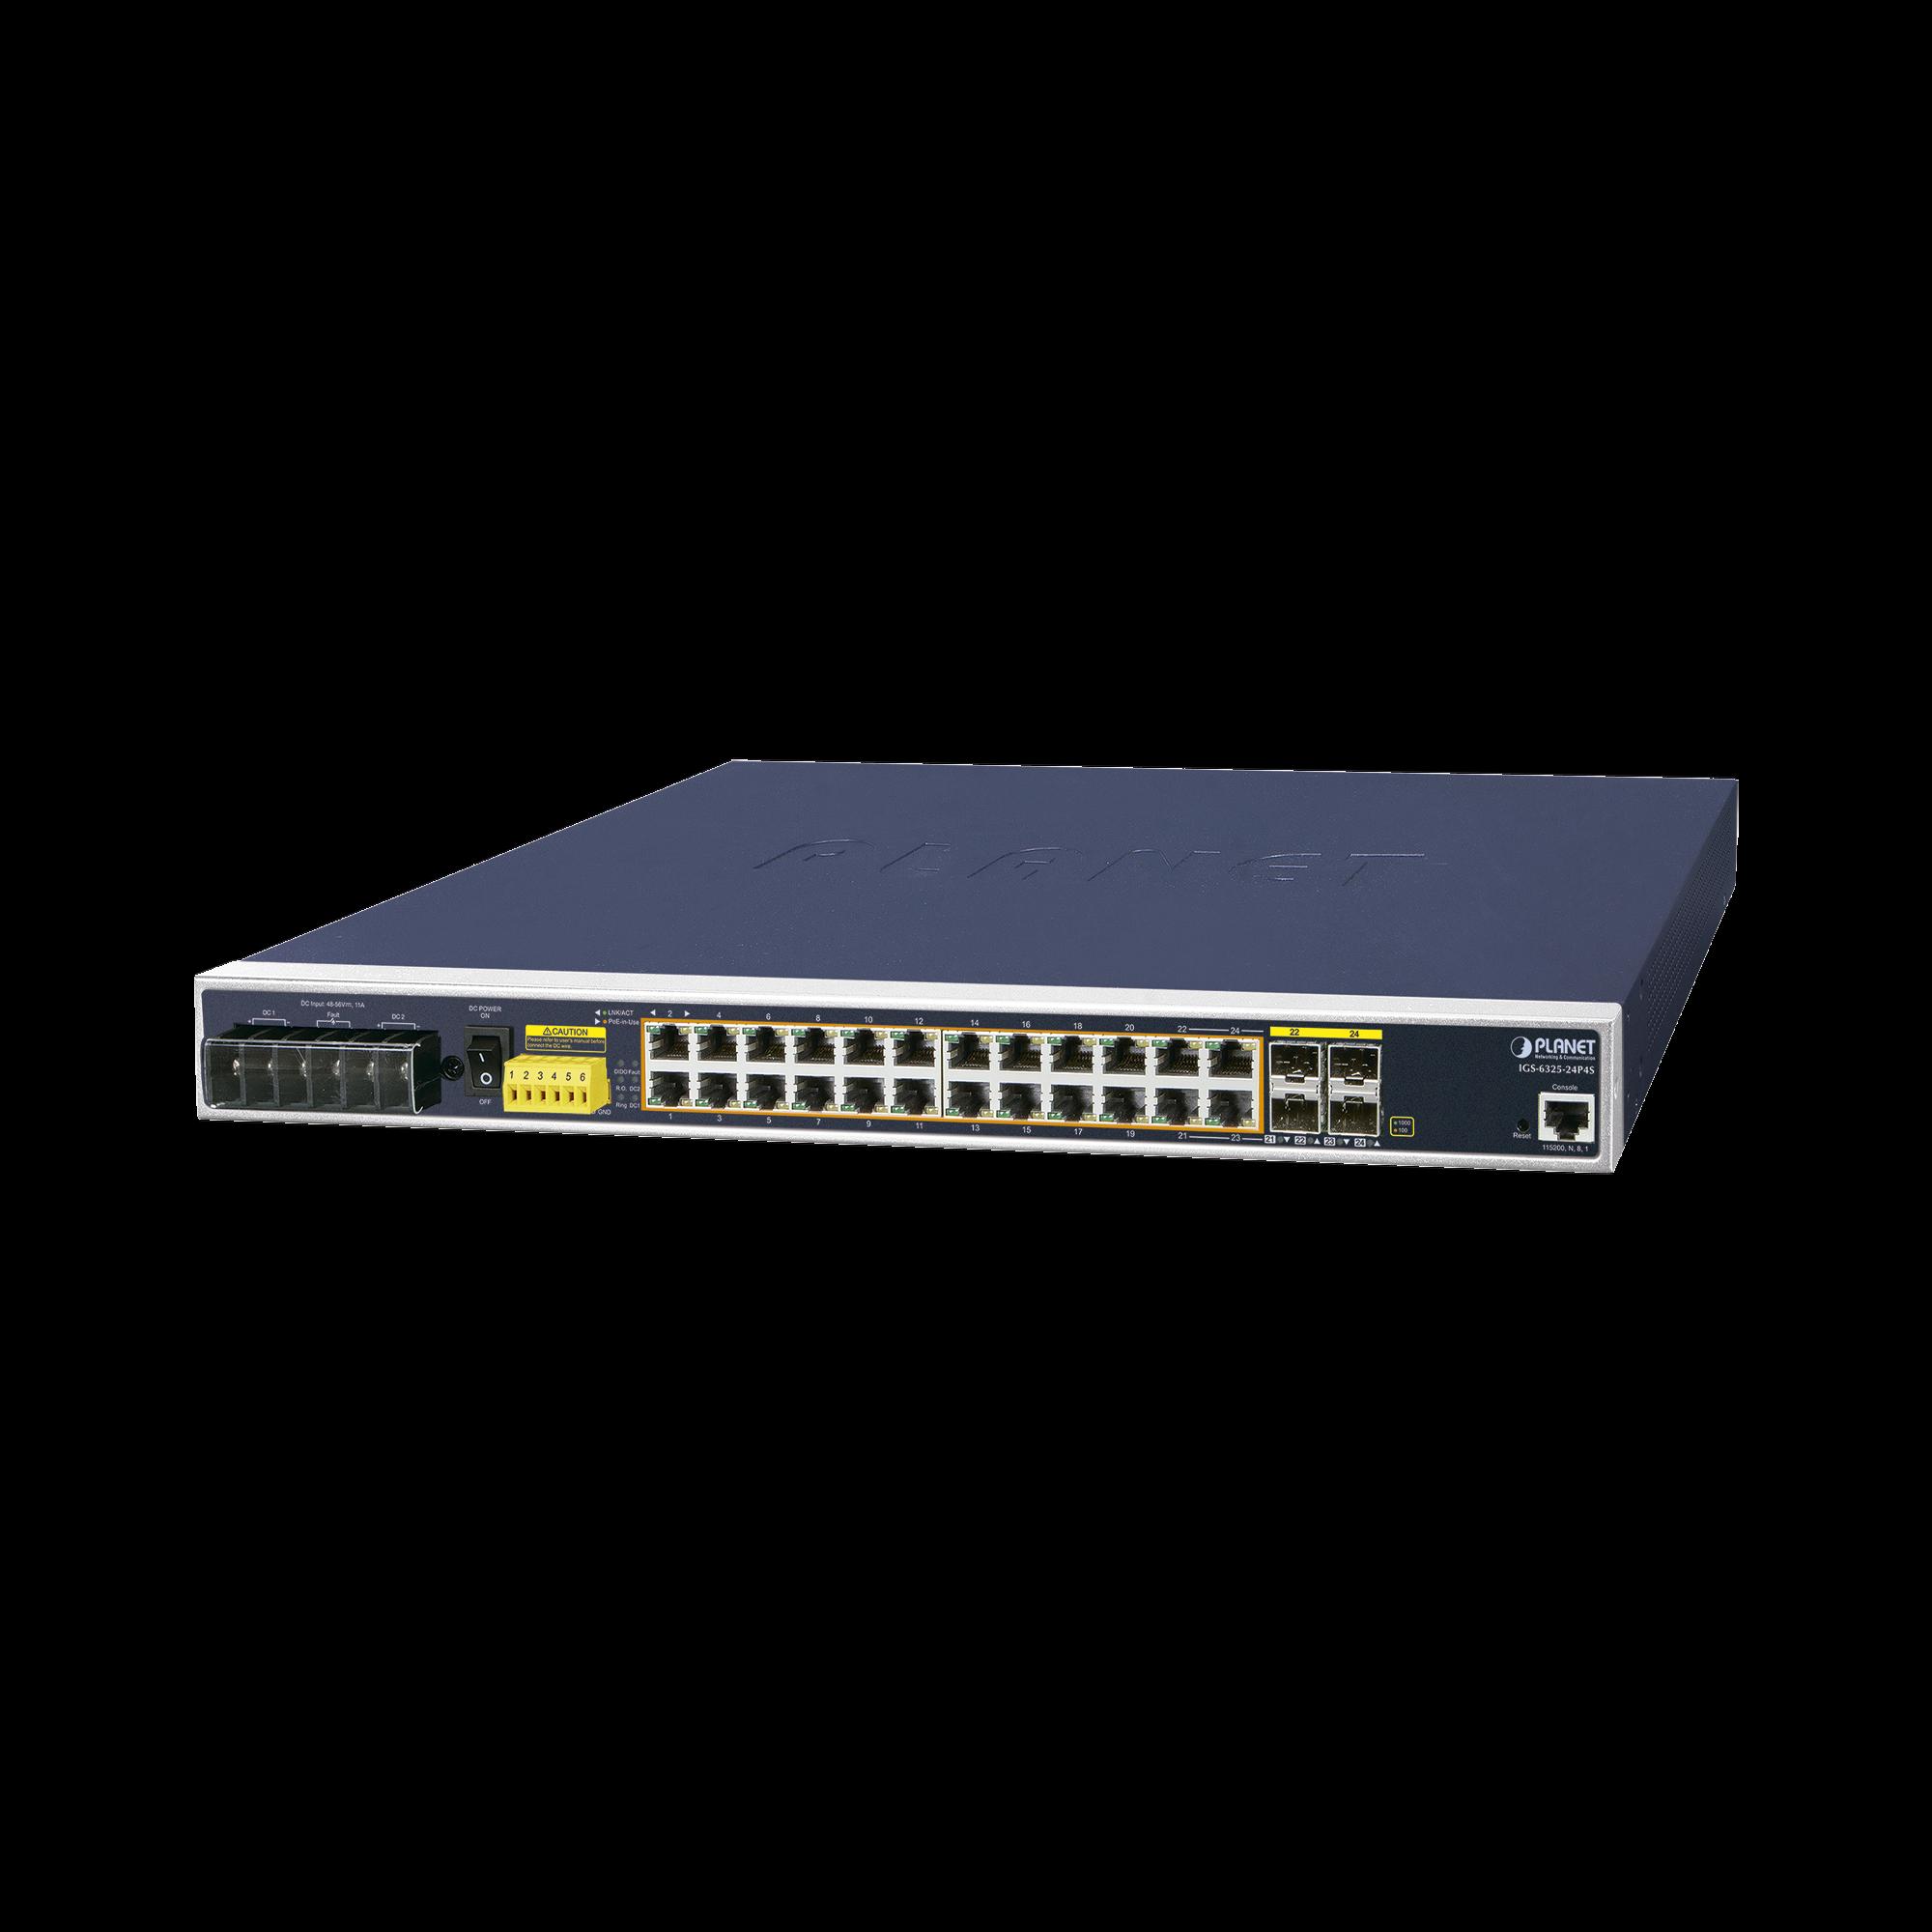 Industrial L3 24 puertos 10/100 / 1000T 802.3at PoE + 4 puertos compartidos 100 / 1000X SFP Managed Ethernet Switch (-40 ~ 75 grados C)